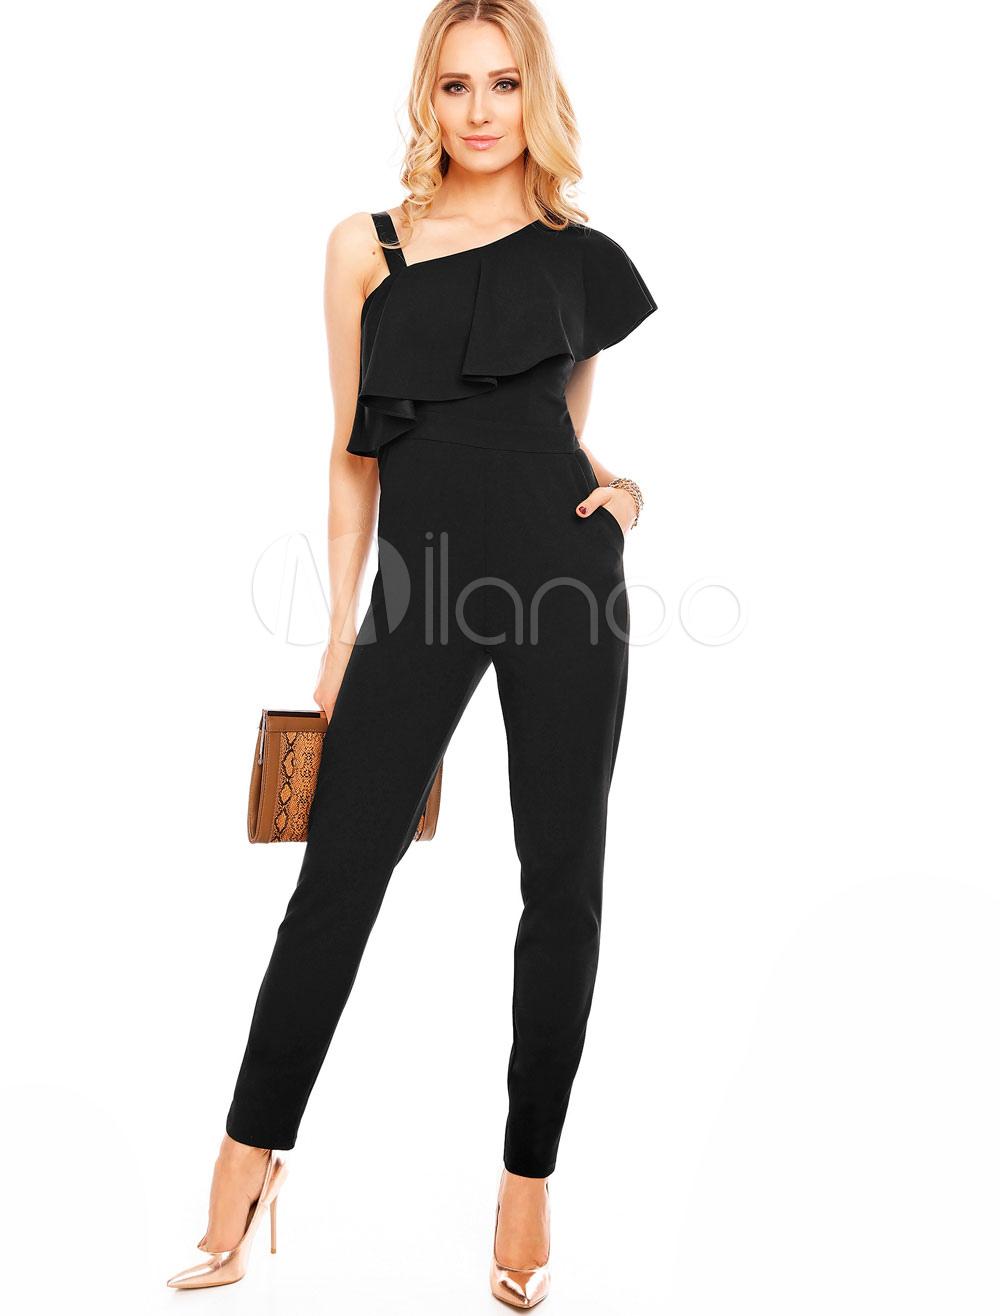 Black Women's Jumpsuit One Shoulder Asymmetrical Short Sleeve Ruffles Long Jumpsuit